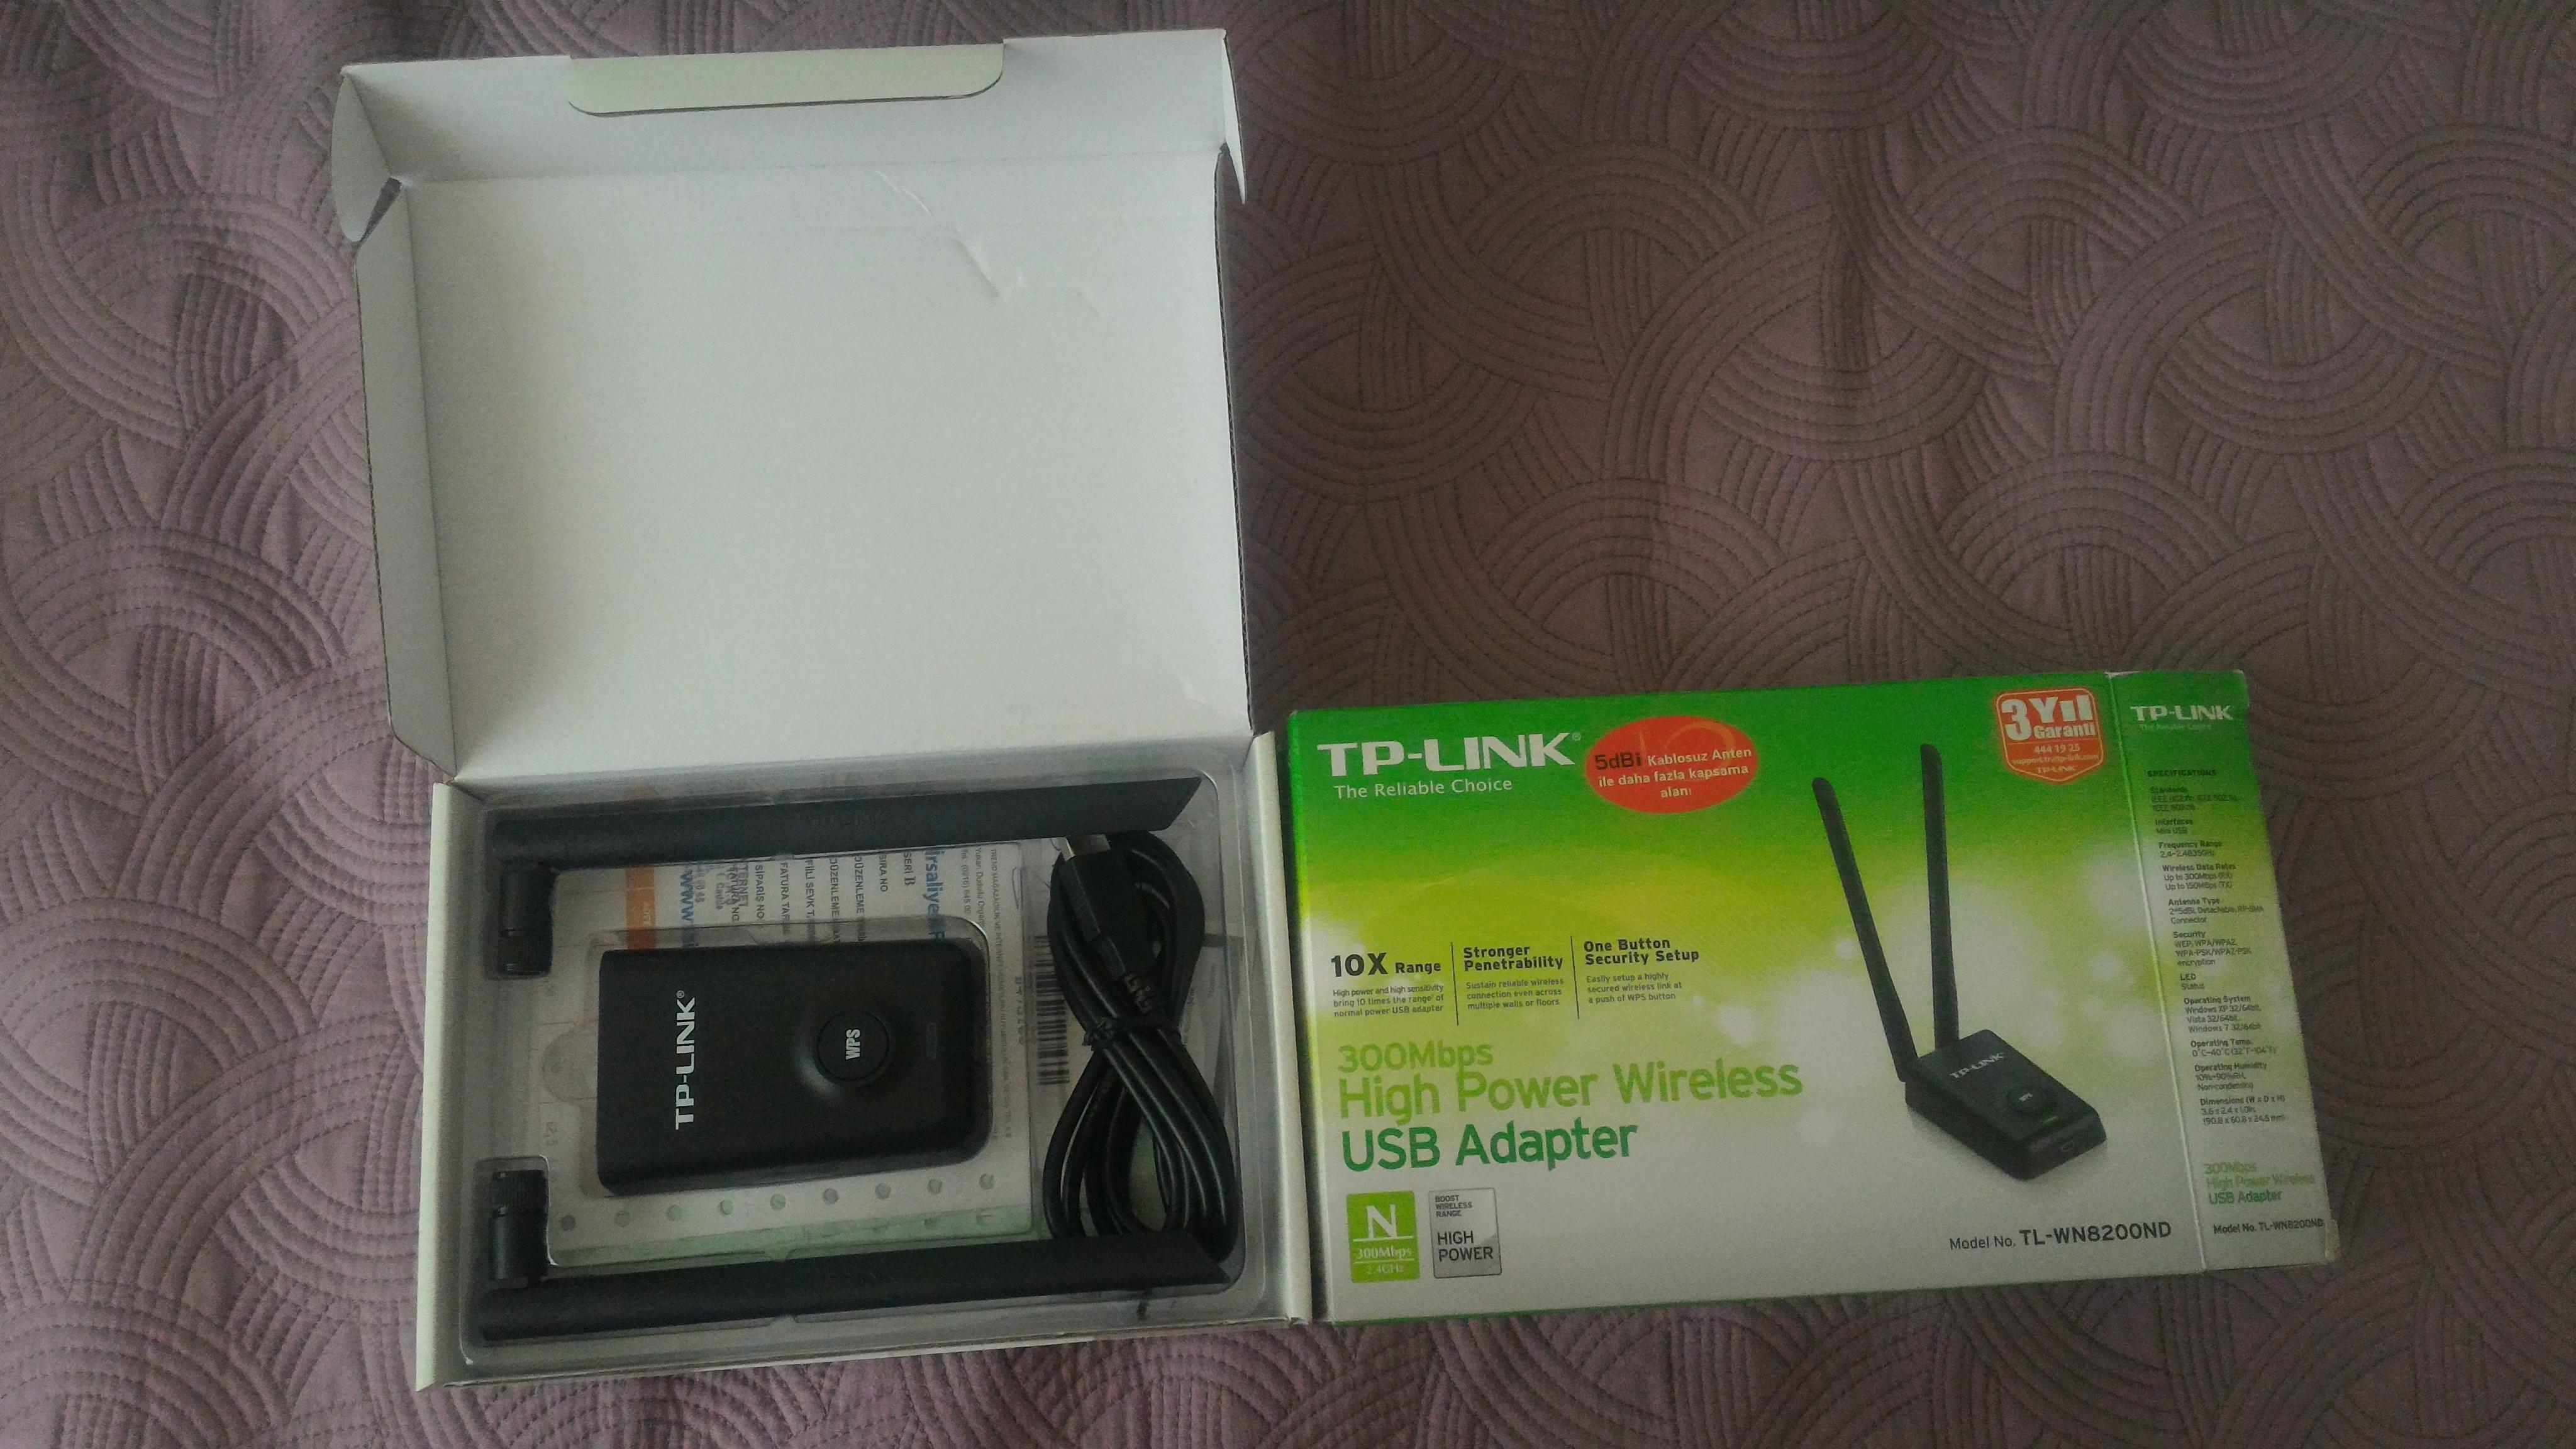 S Tp Link Tl Wa801nd Kablosuz Access Point Wn8200nd 300mbps High Power Usb Adapter Wifi Adaptr 4x 8dbi Anten Sayfa 1